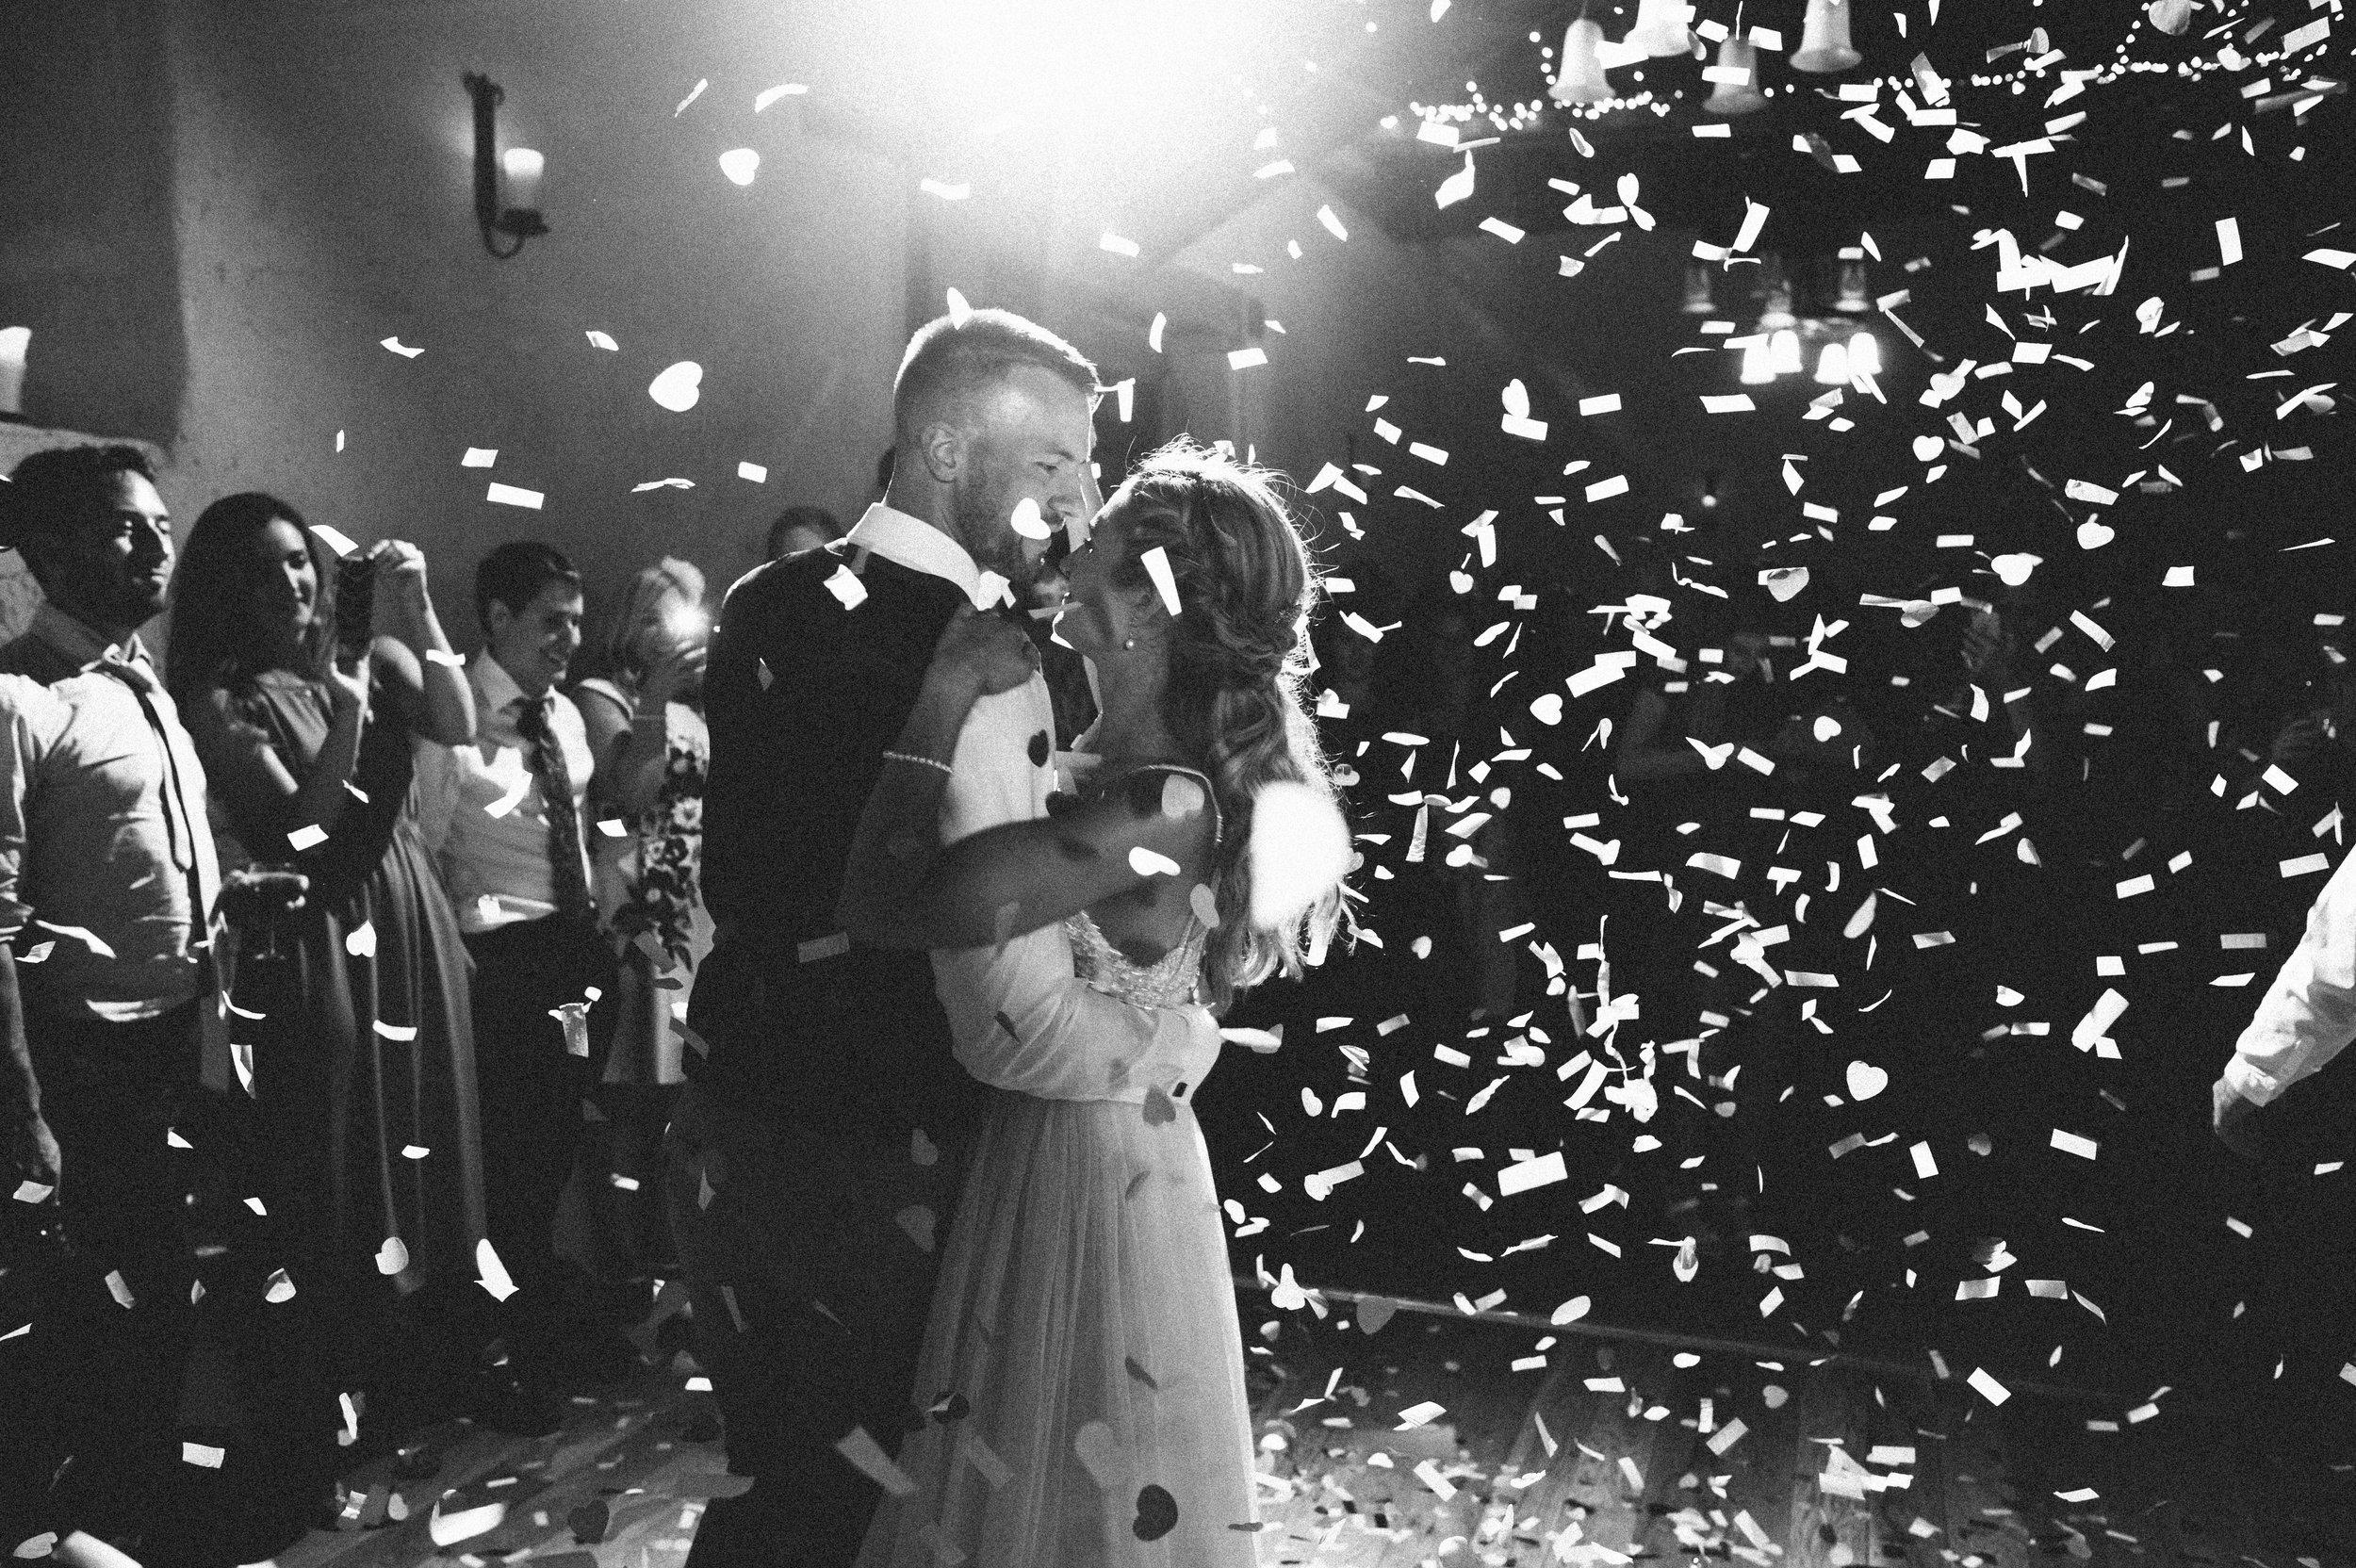 alternative wedding photography cornwall harrera images-011.jpg